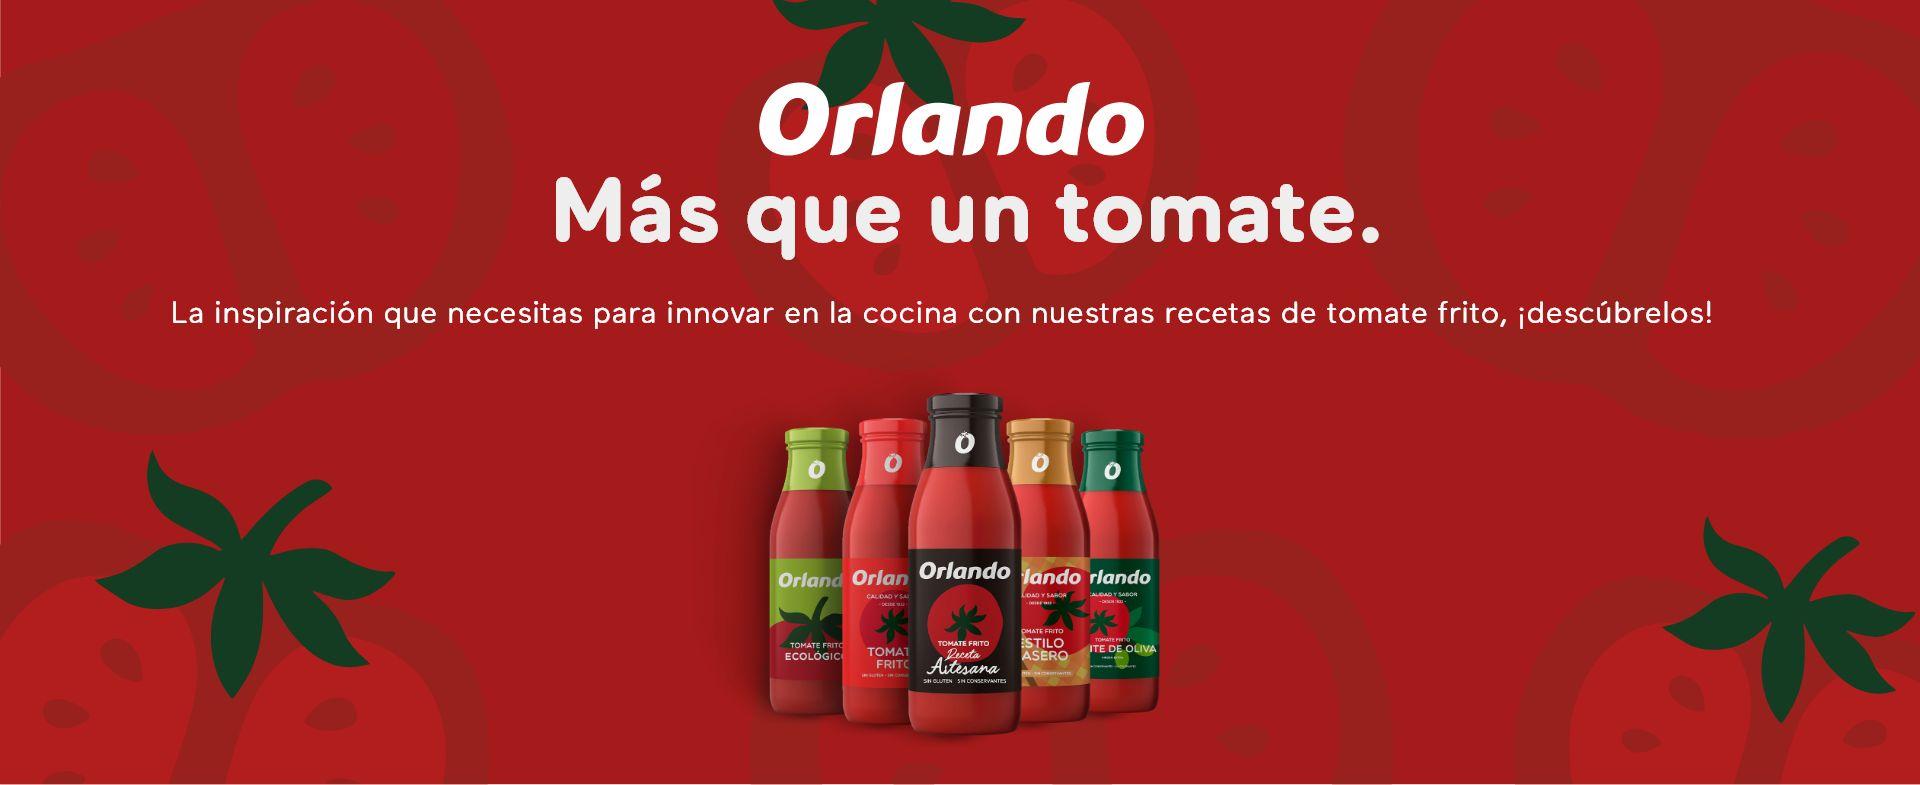 Imagen de banner de salsa de tomate